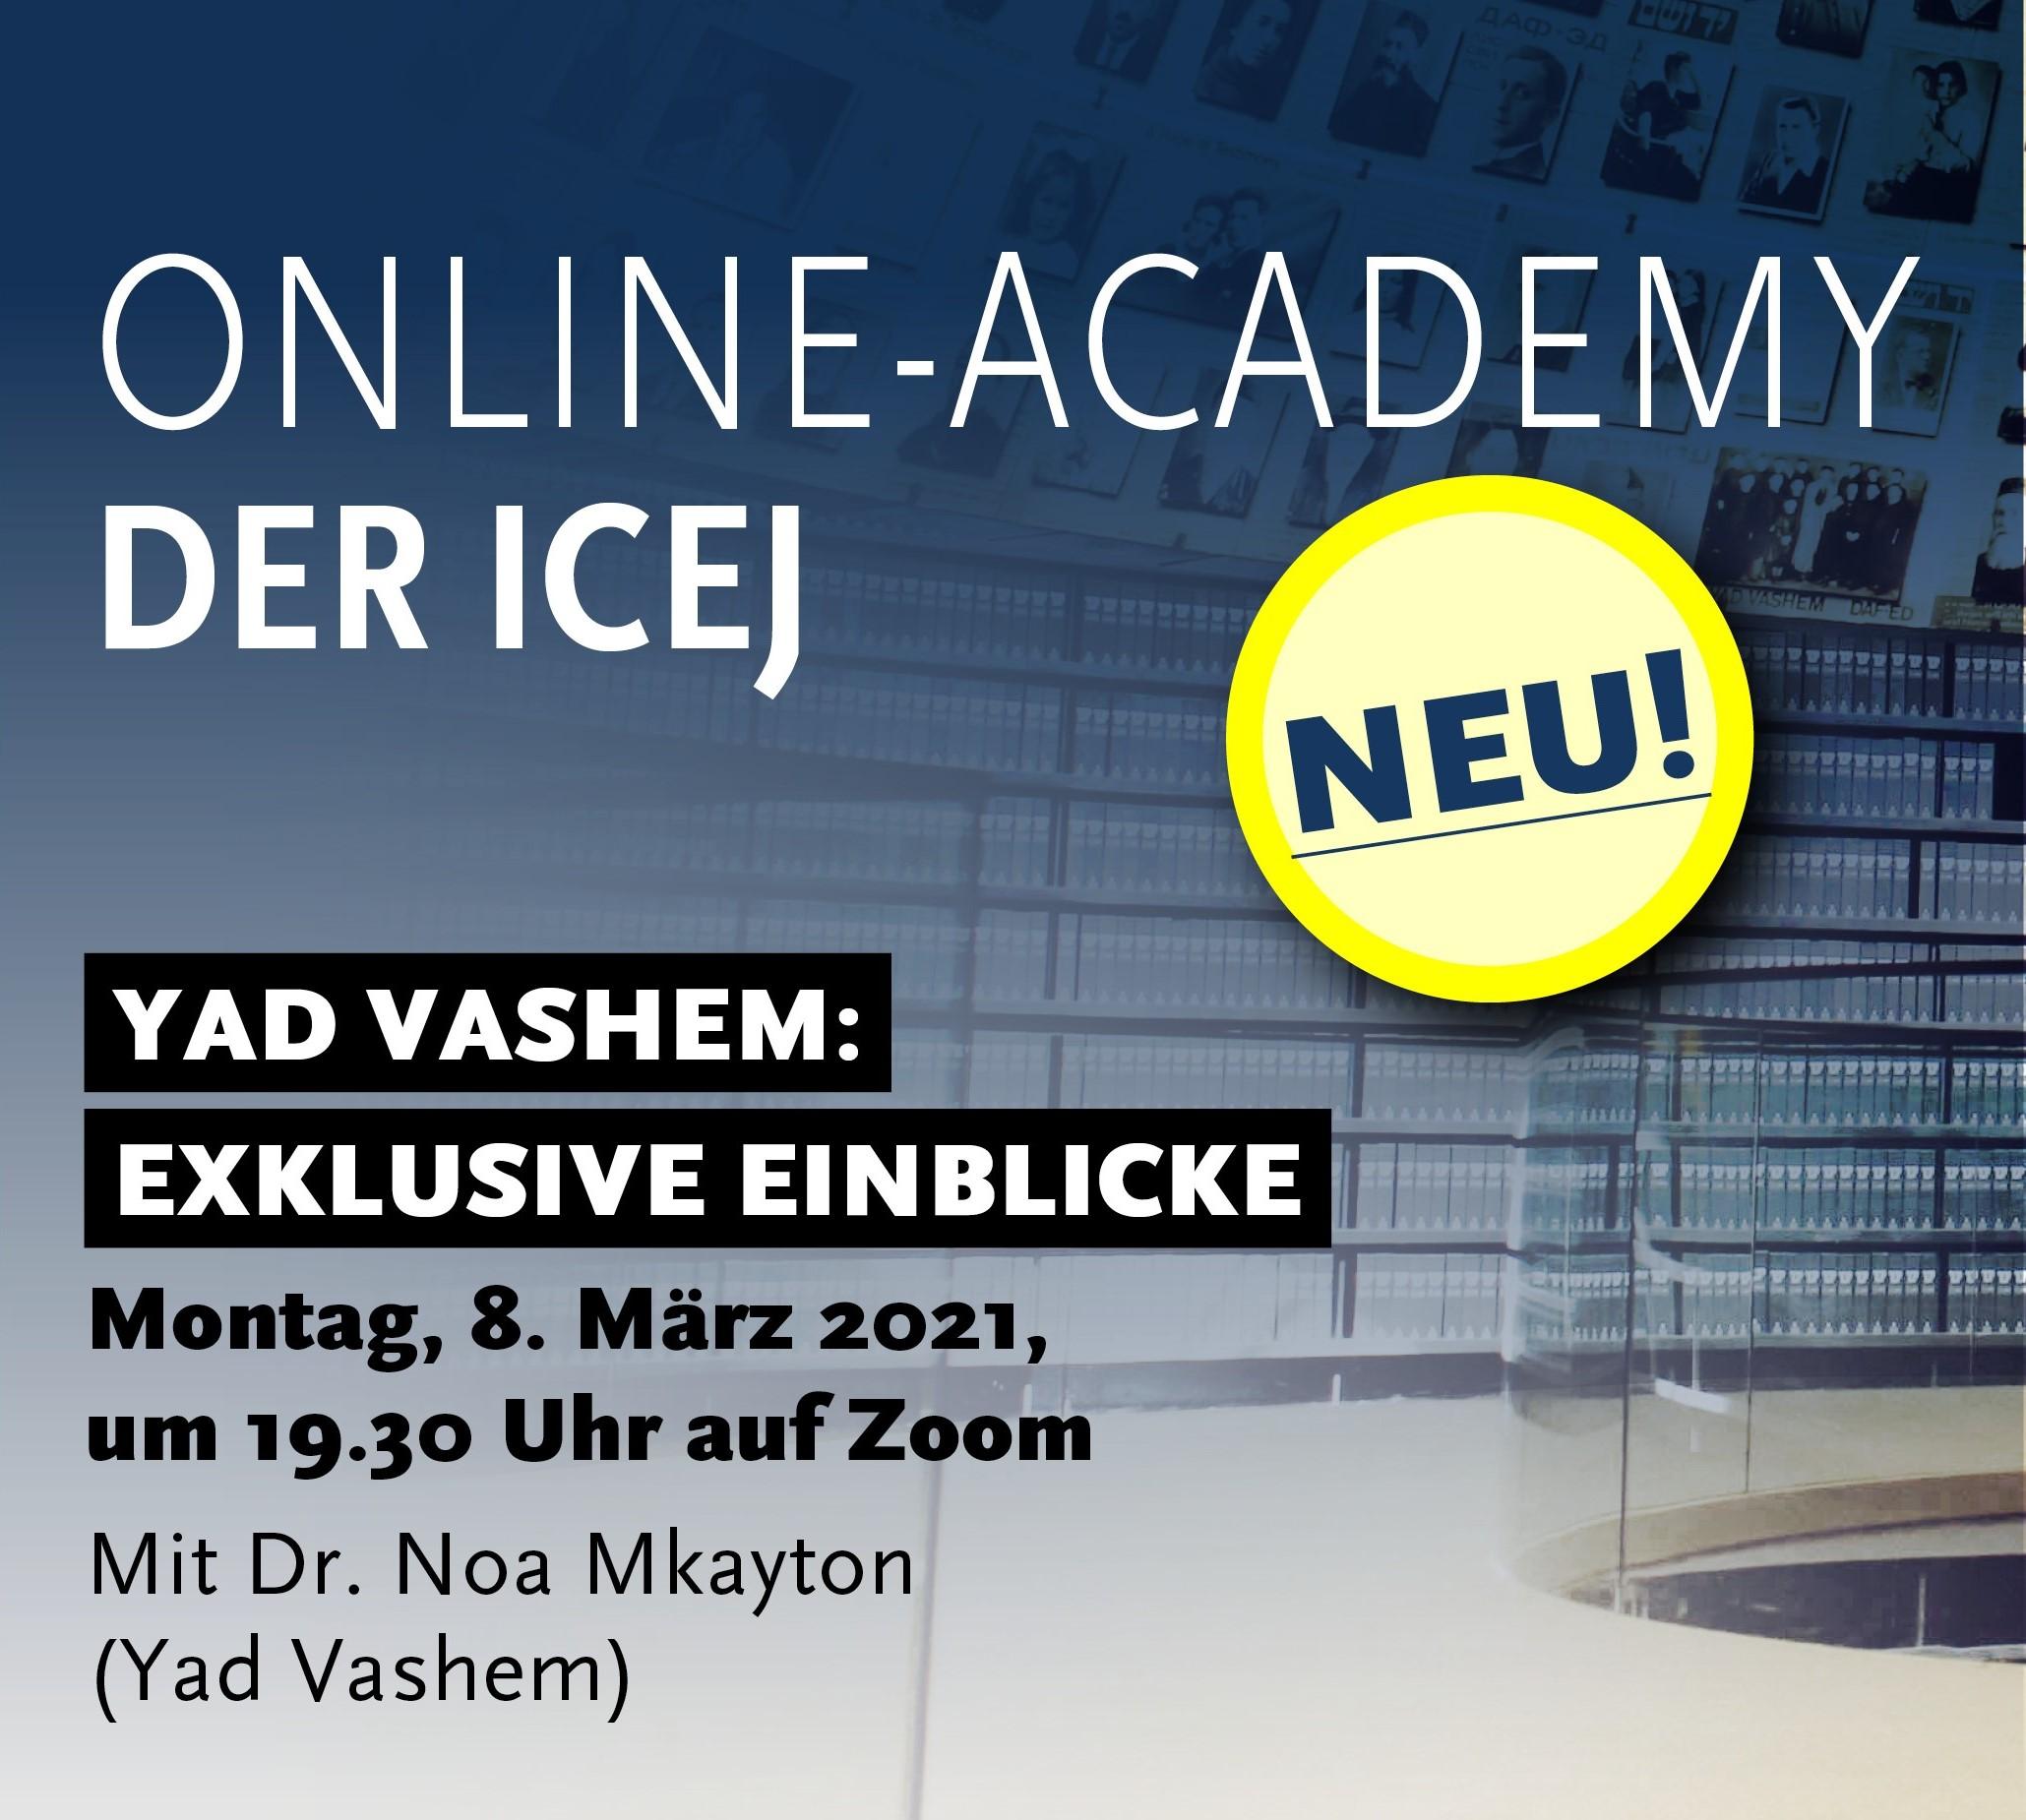 YAD VASHEM: EXKLUSIVE EINBLICKE